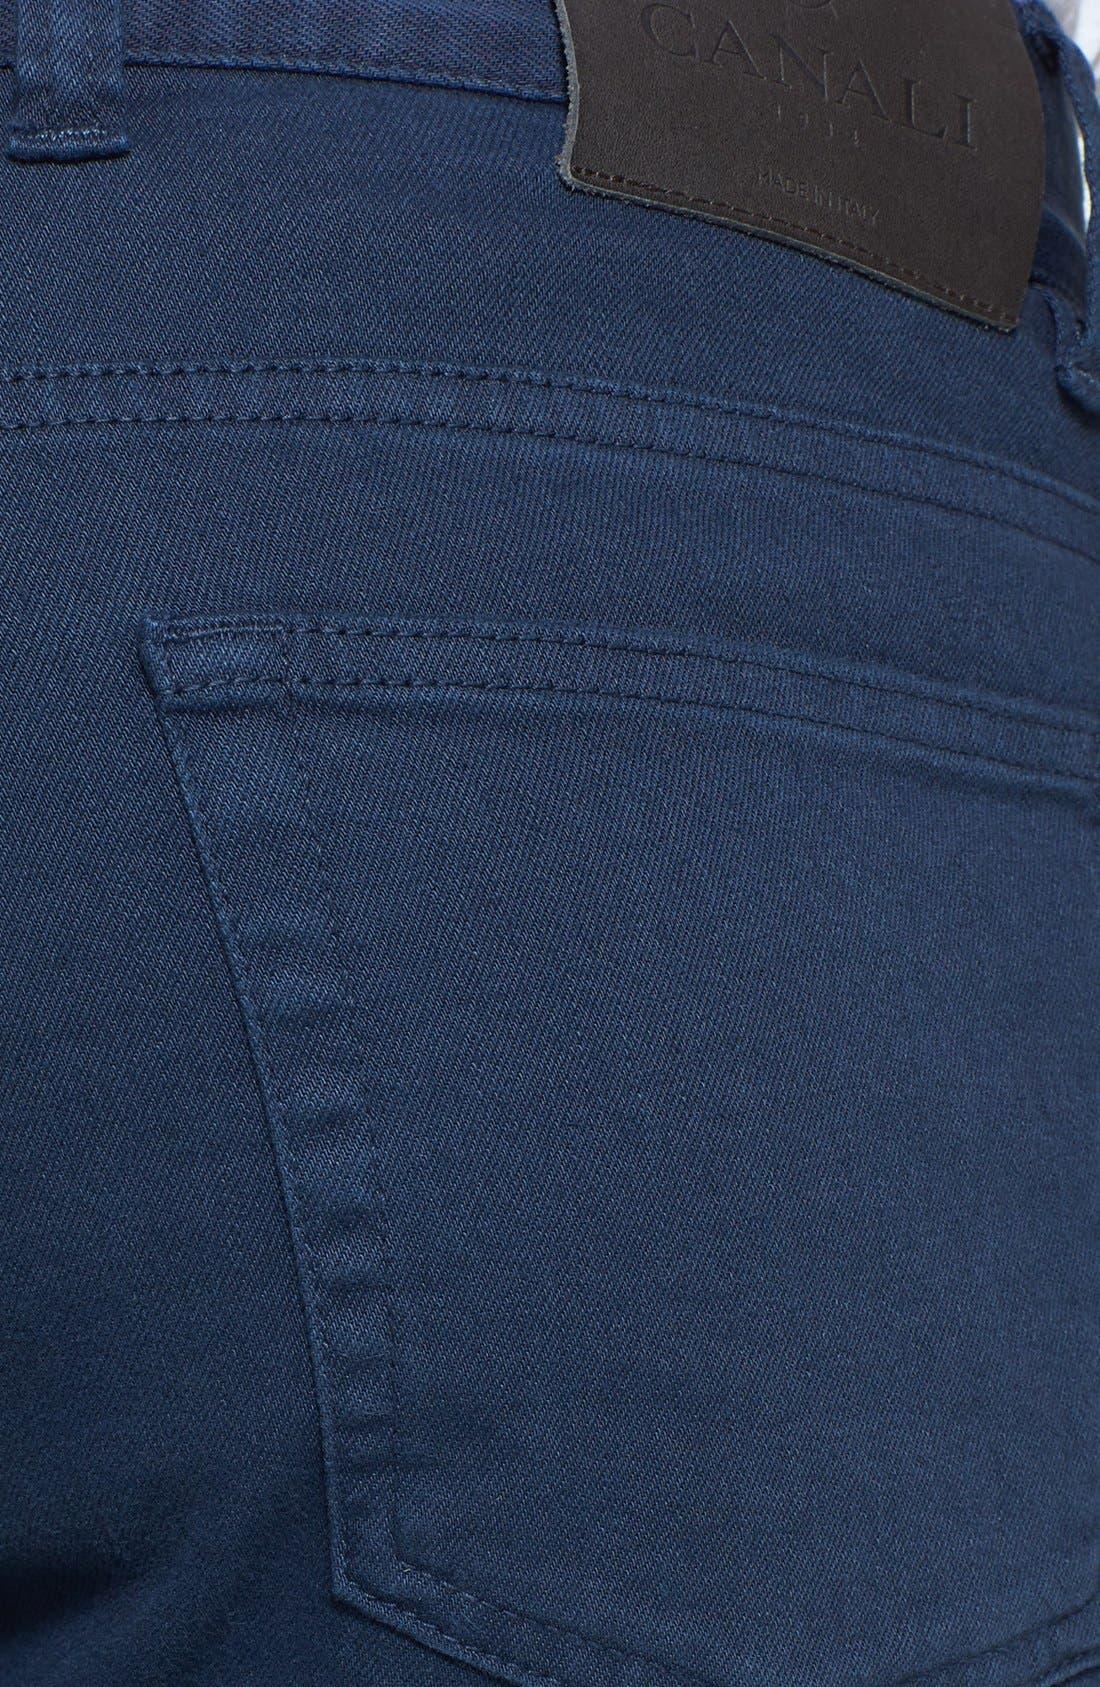 Alternate Image 3  - Canali Stretch Cotton Pants